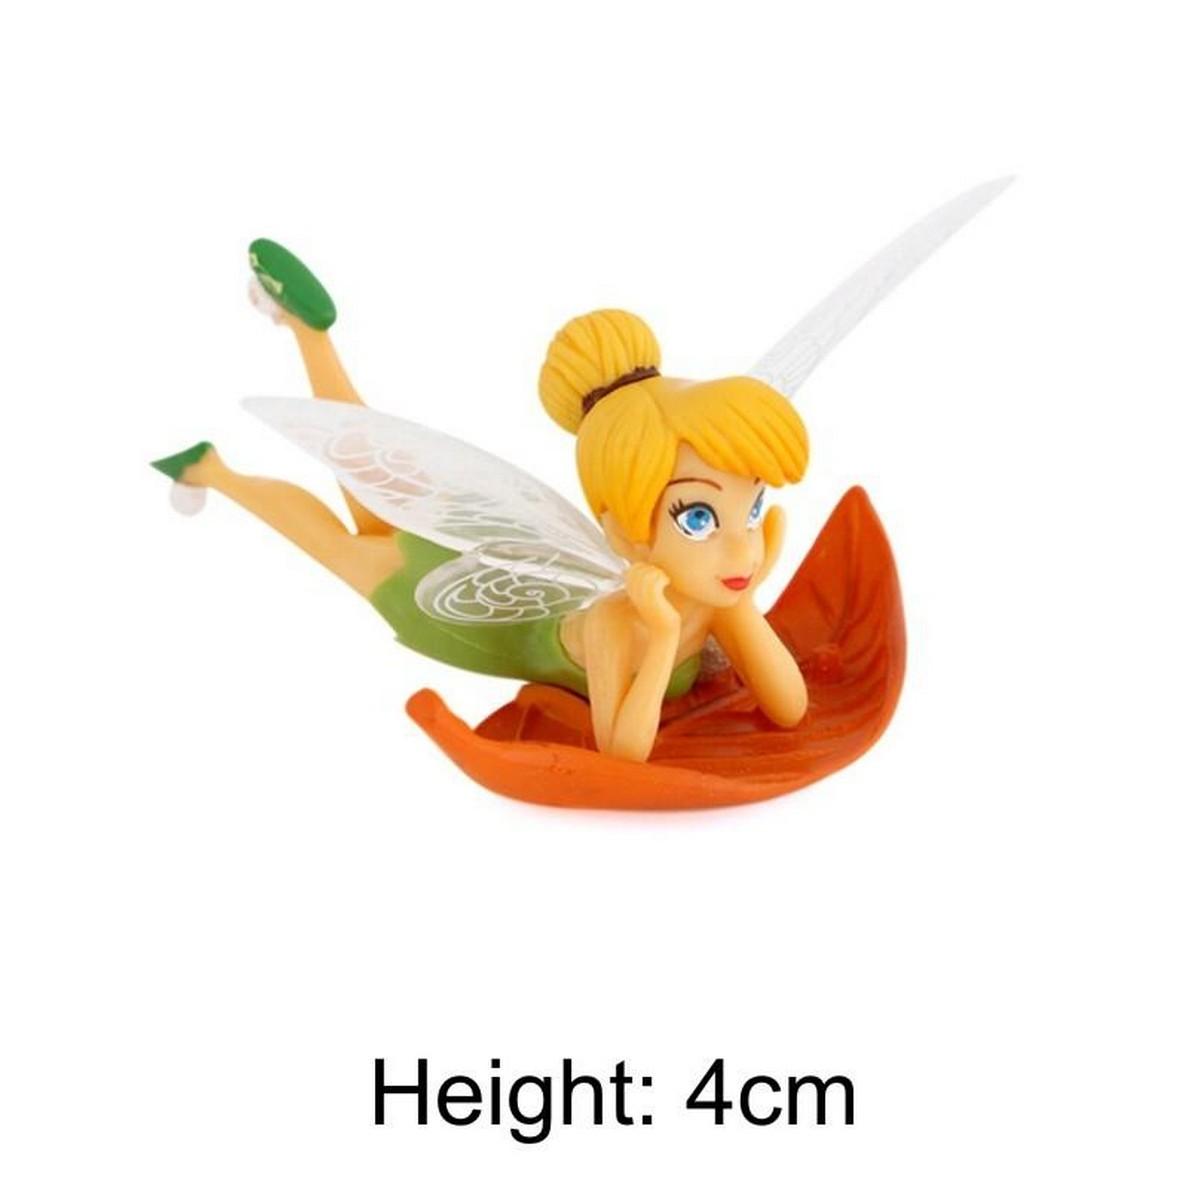 Tinker Bell Fairy Figures Miniature Garden Dollhouse Decor Doll Toy Gift